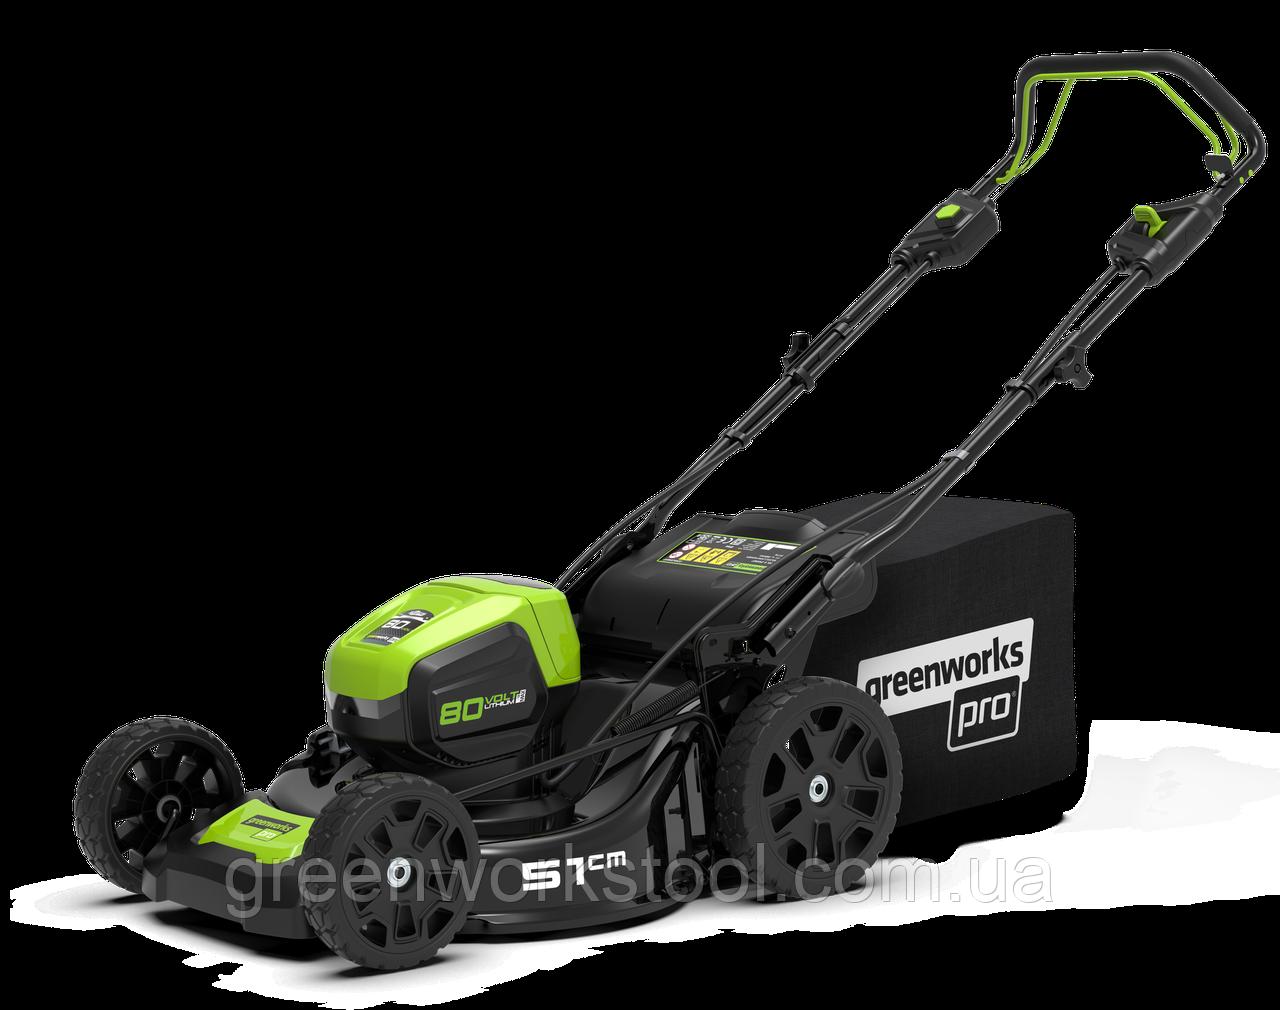 Мощная самоходная аккумуляторная  газонокосилка GreenWorks GD80LM51SP Pro 80V 51 см бесщёточная без АКБ и ЗУ